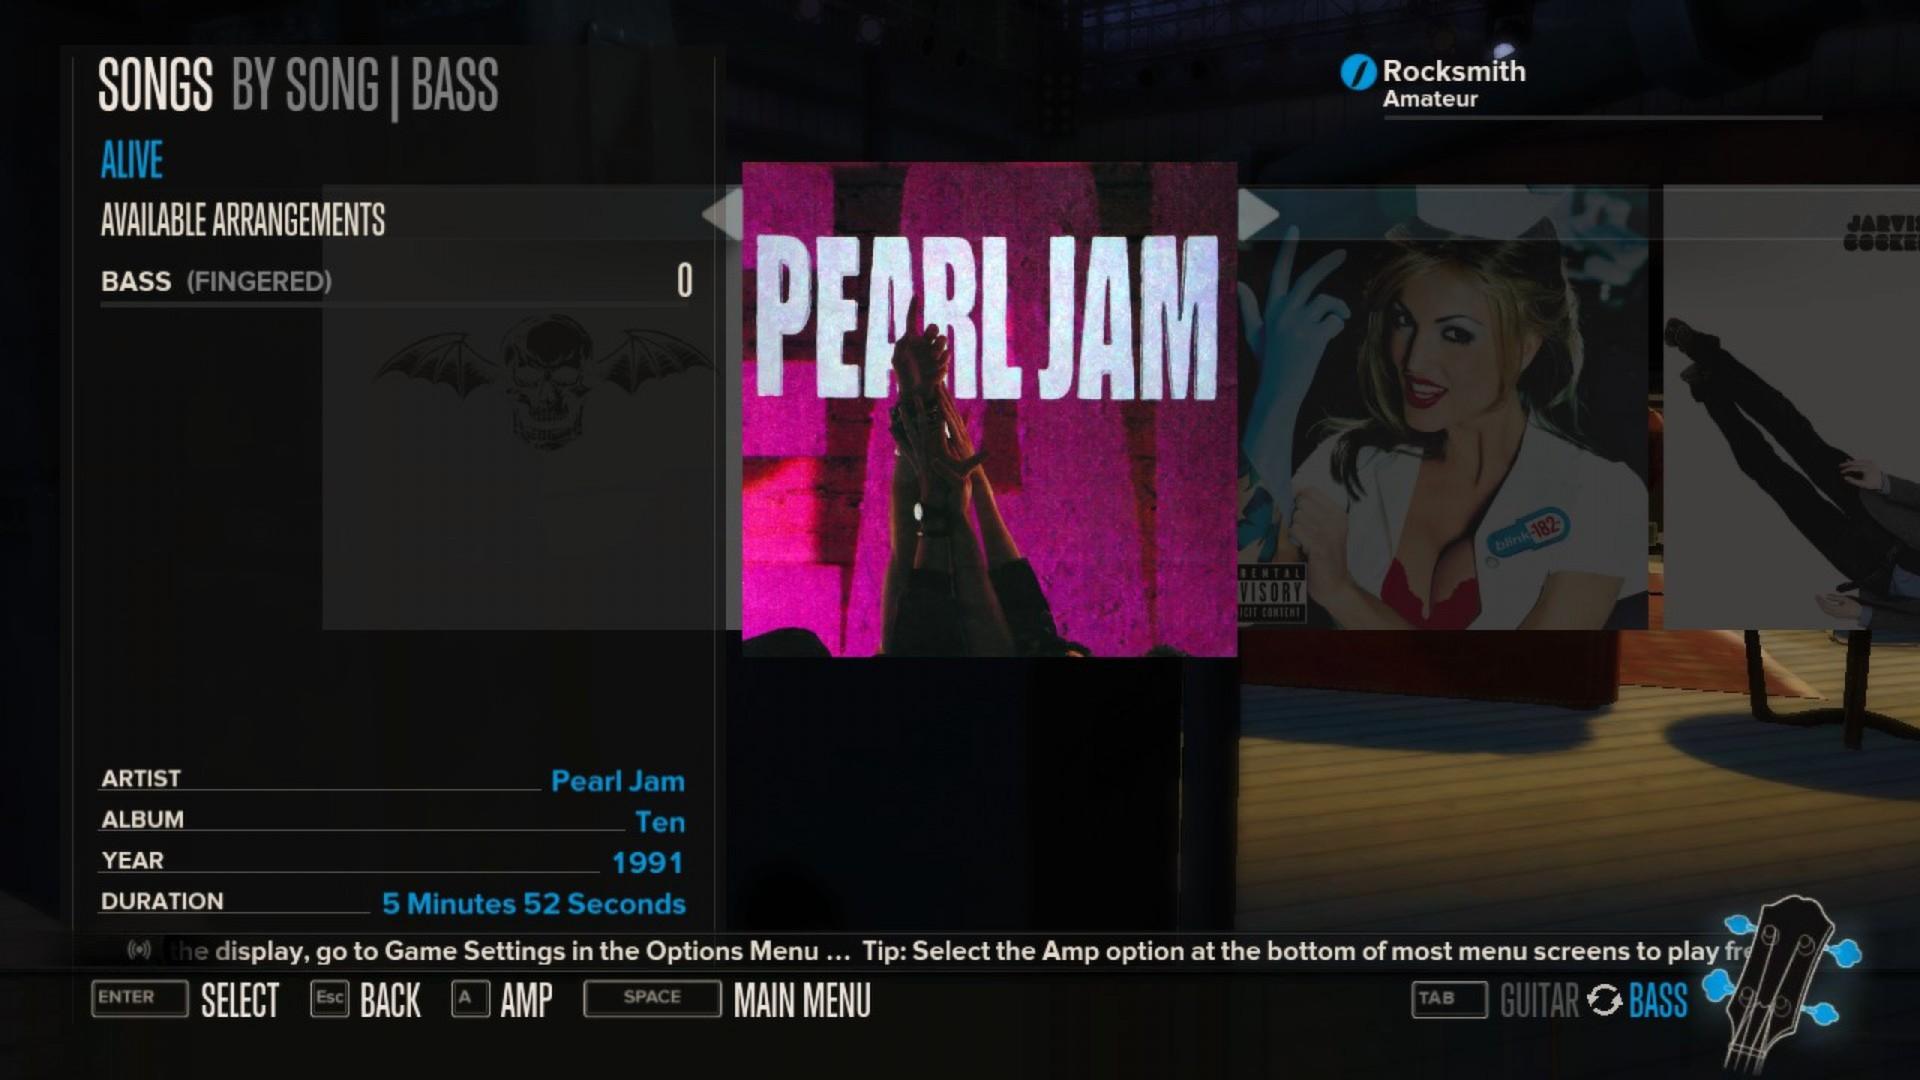 Rocksmith - Pearl Jam - Alive